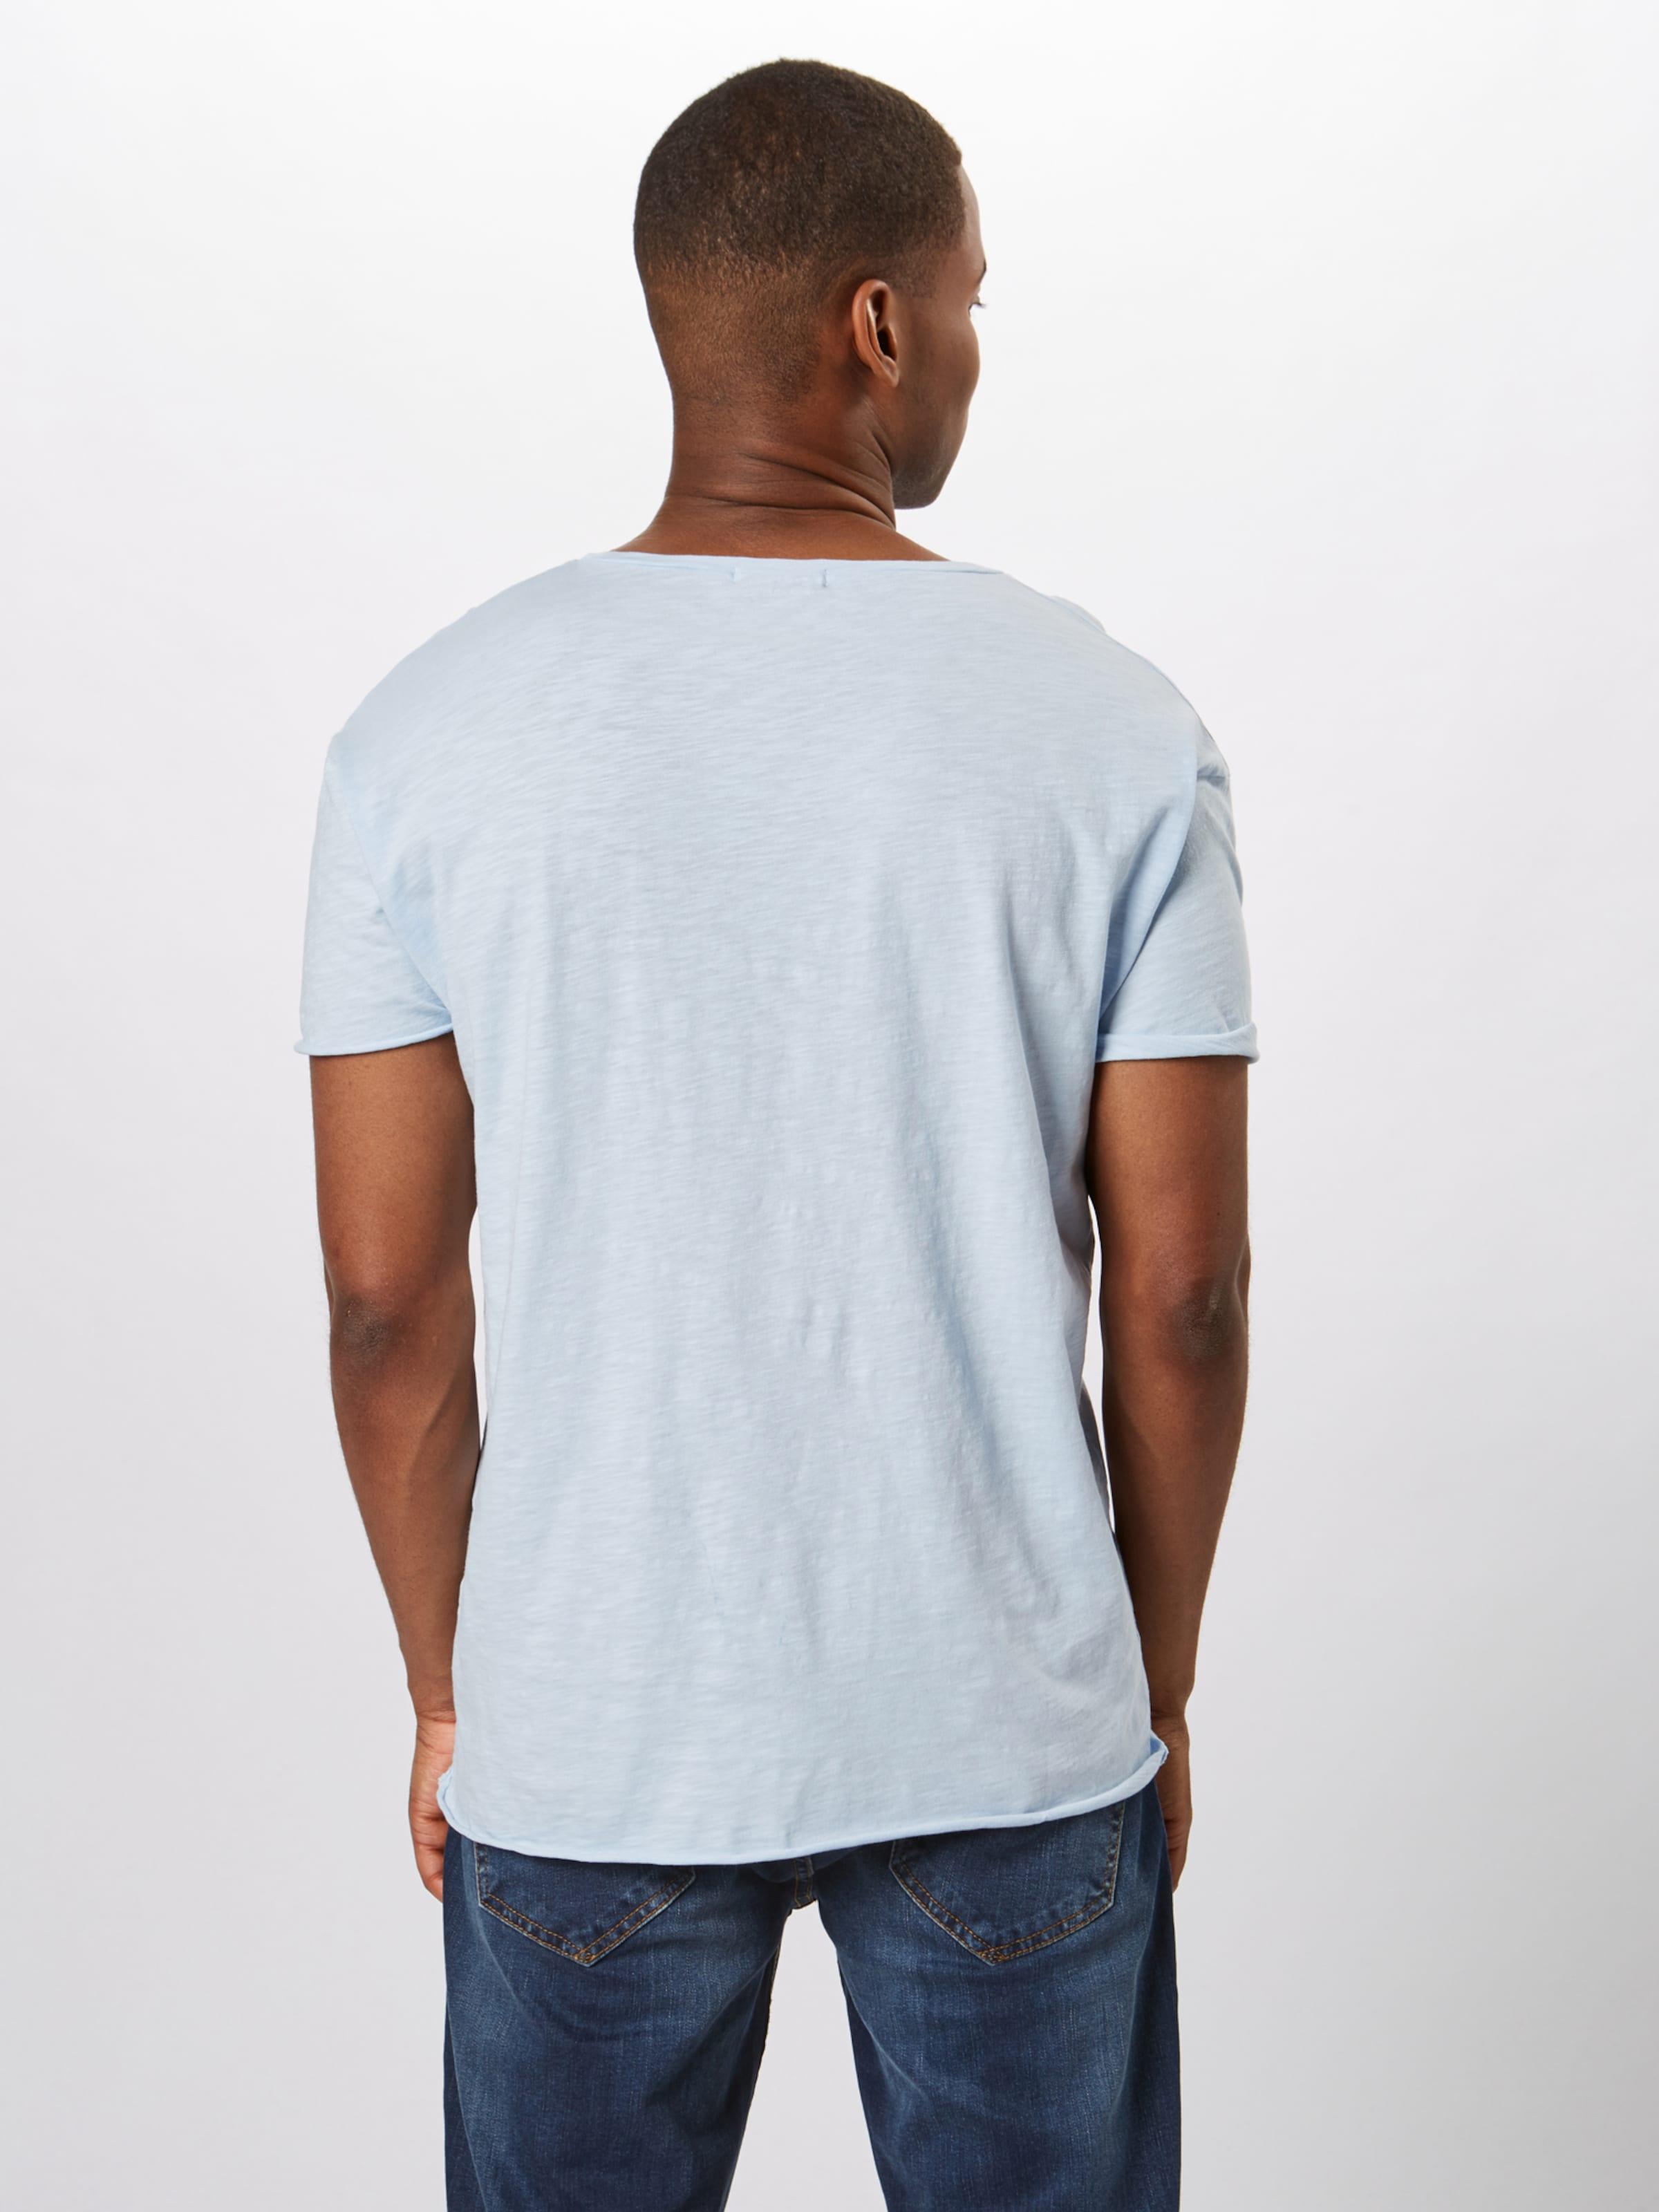 shirt Co 'roger Jeans T Clair Slub' Bleu Nudie En 0kwPnO